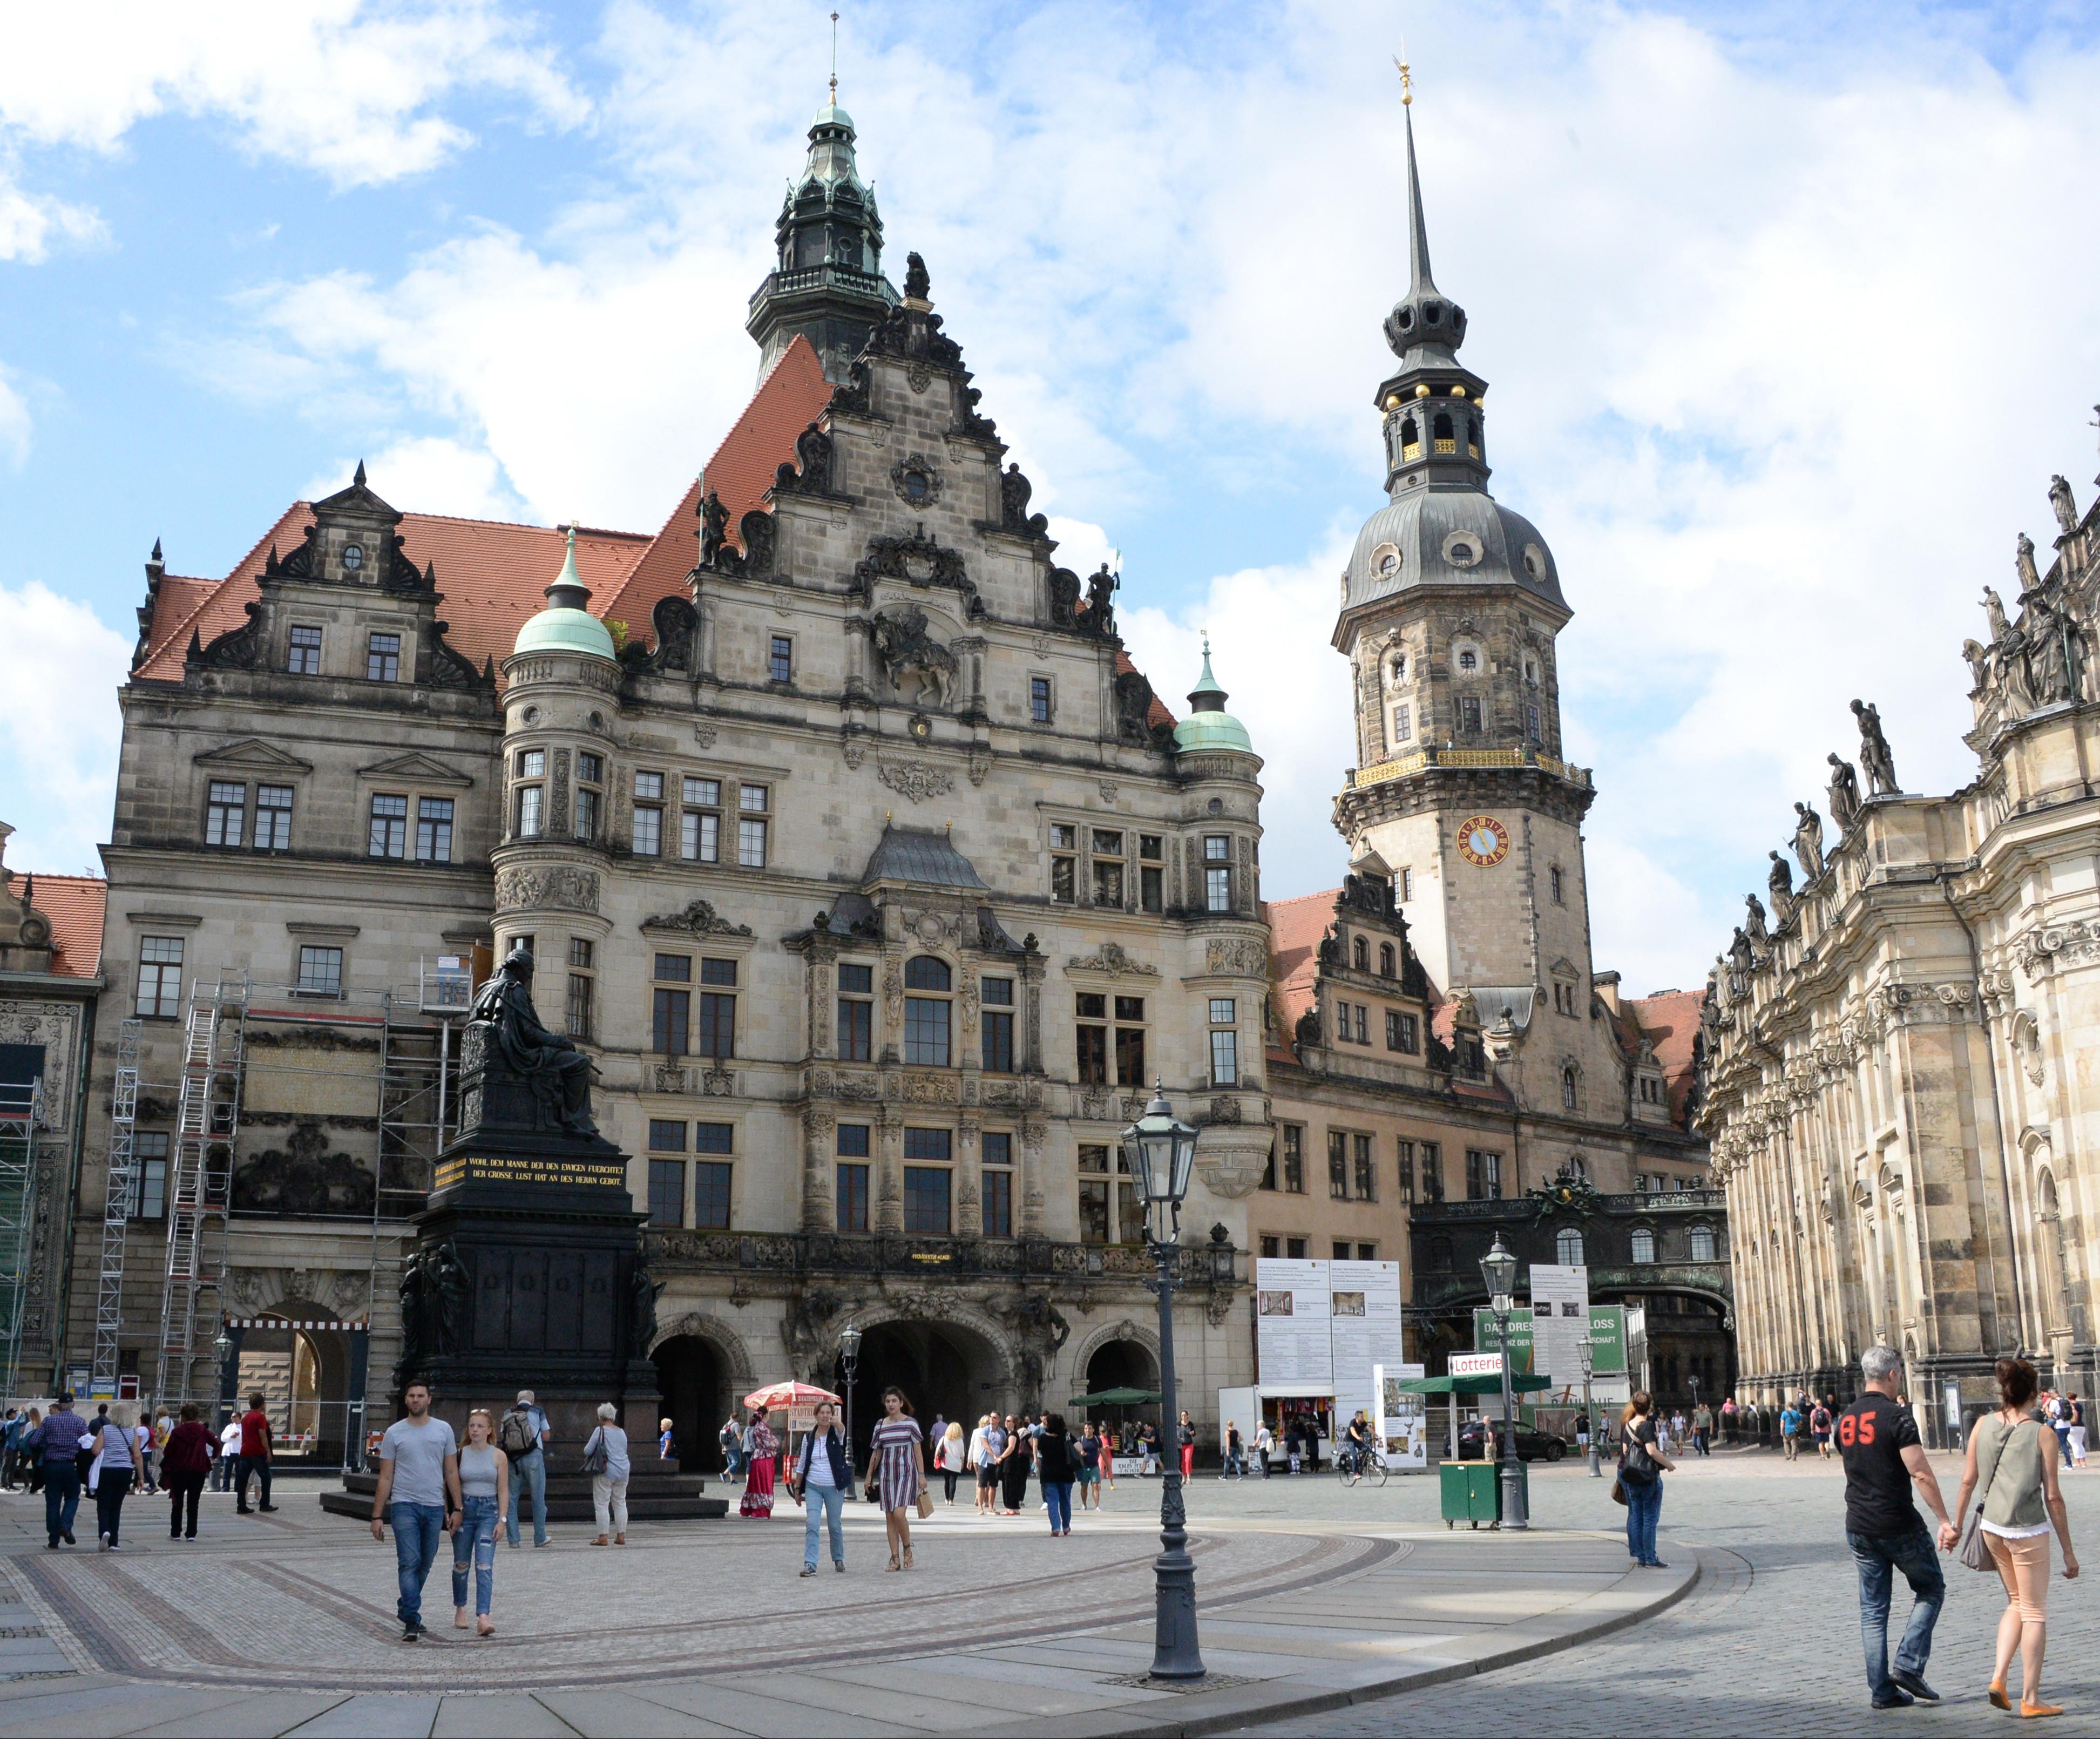 <p>Дрезден. Фото: &copy;РИА Новости Владимир Федоренко</p>